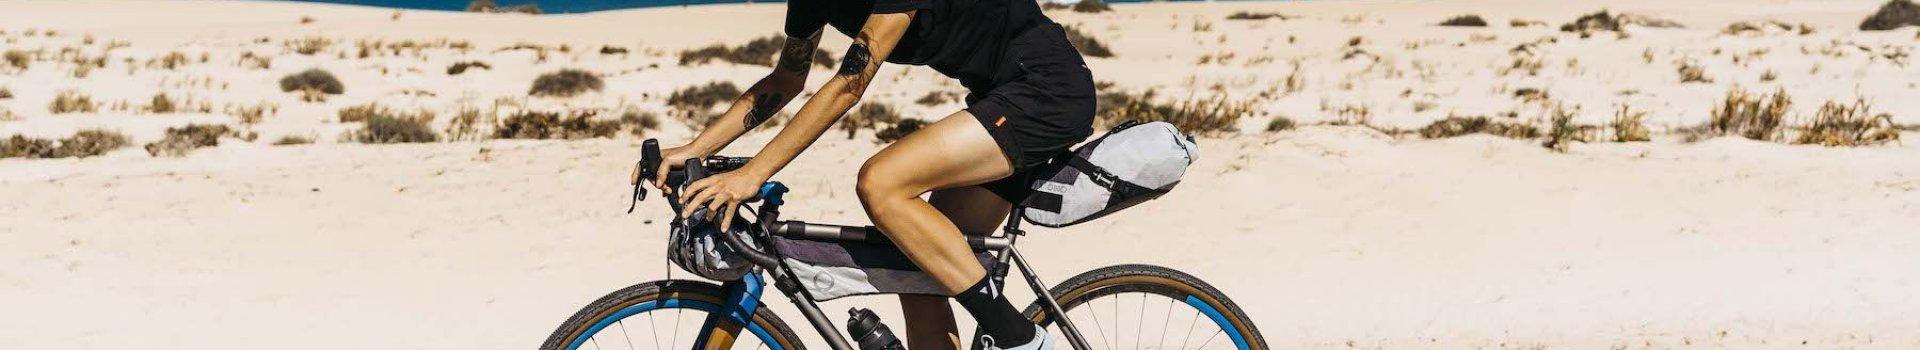 Czym są rowery typu gravel?